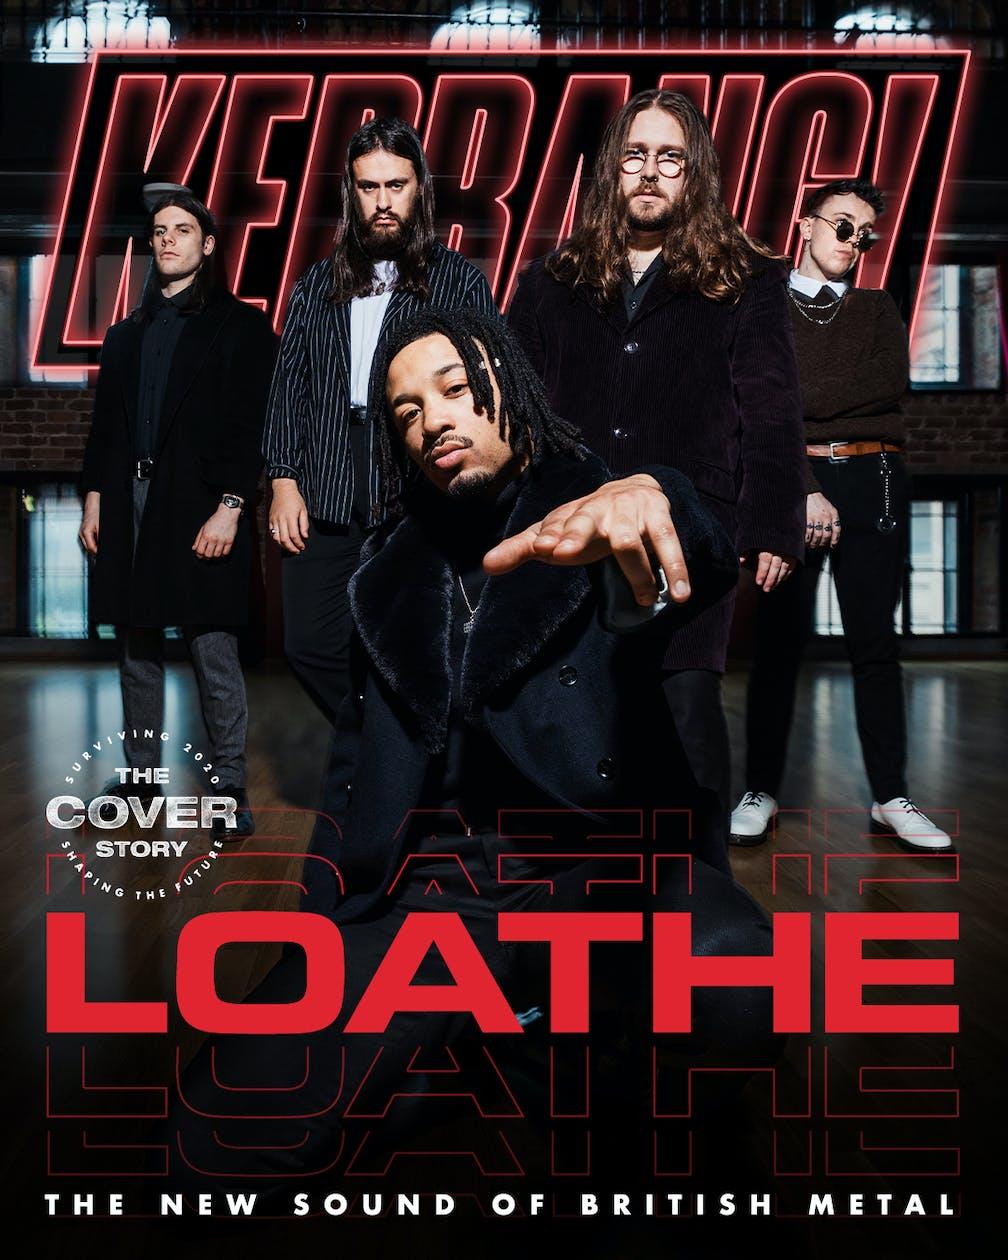 CREDIT: Kerrang! Magazine